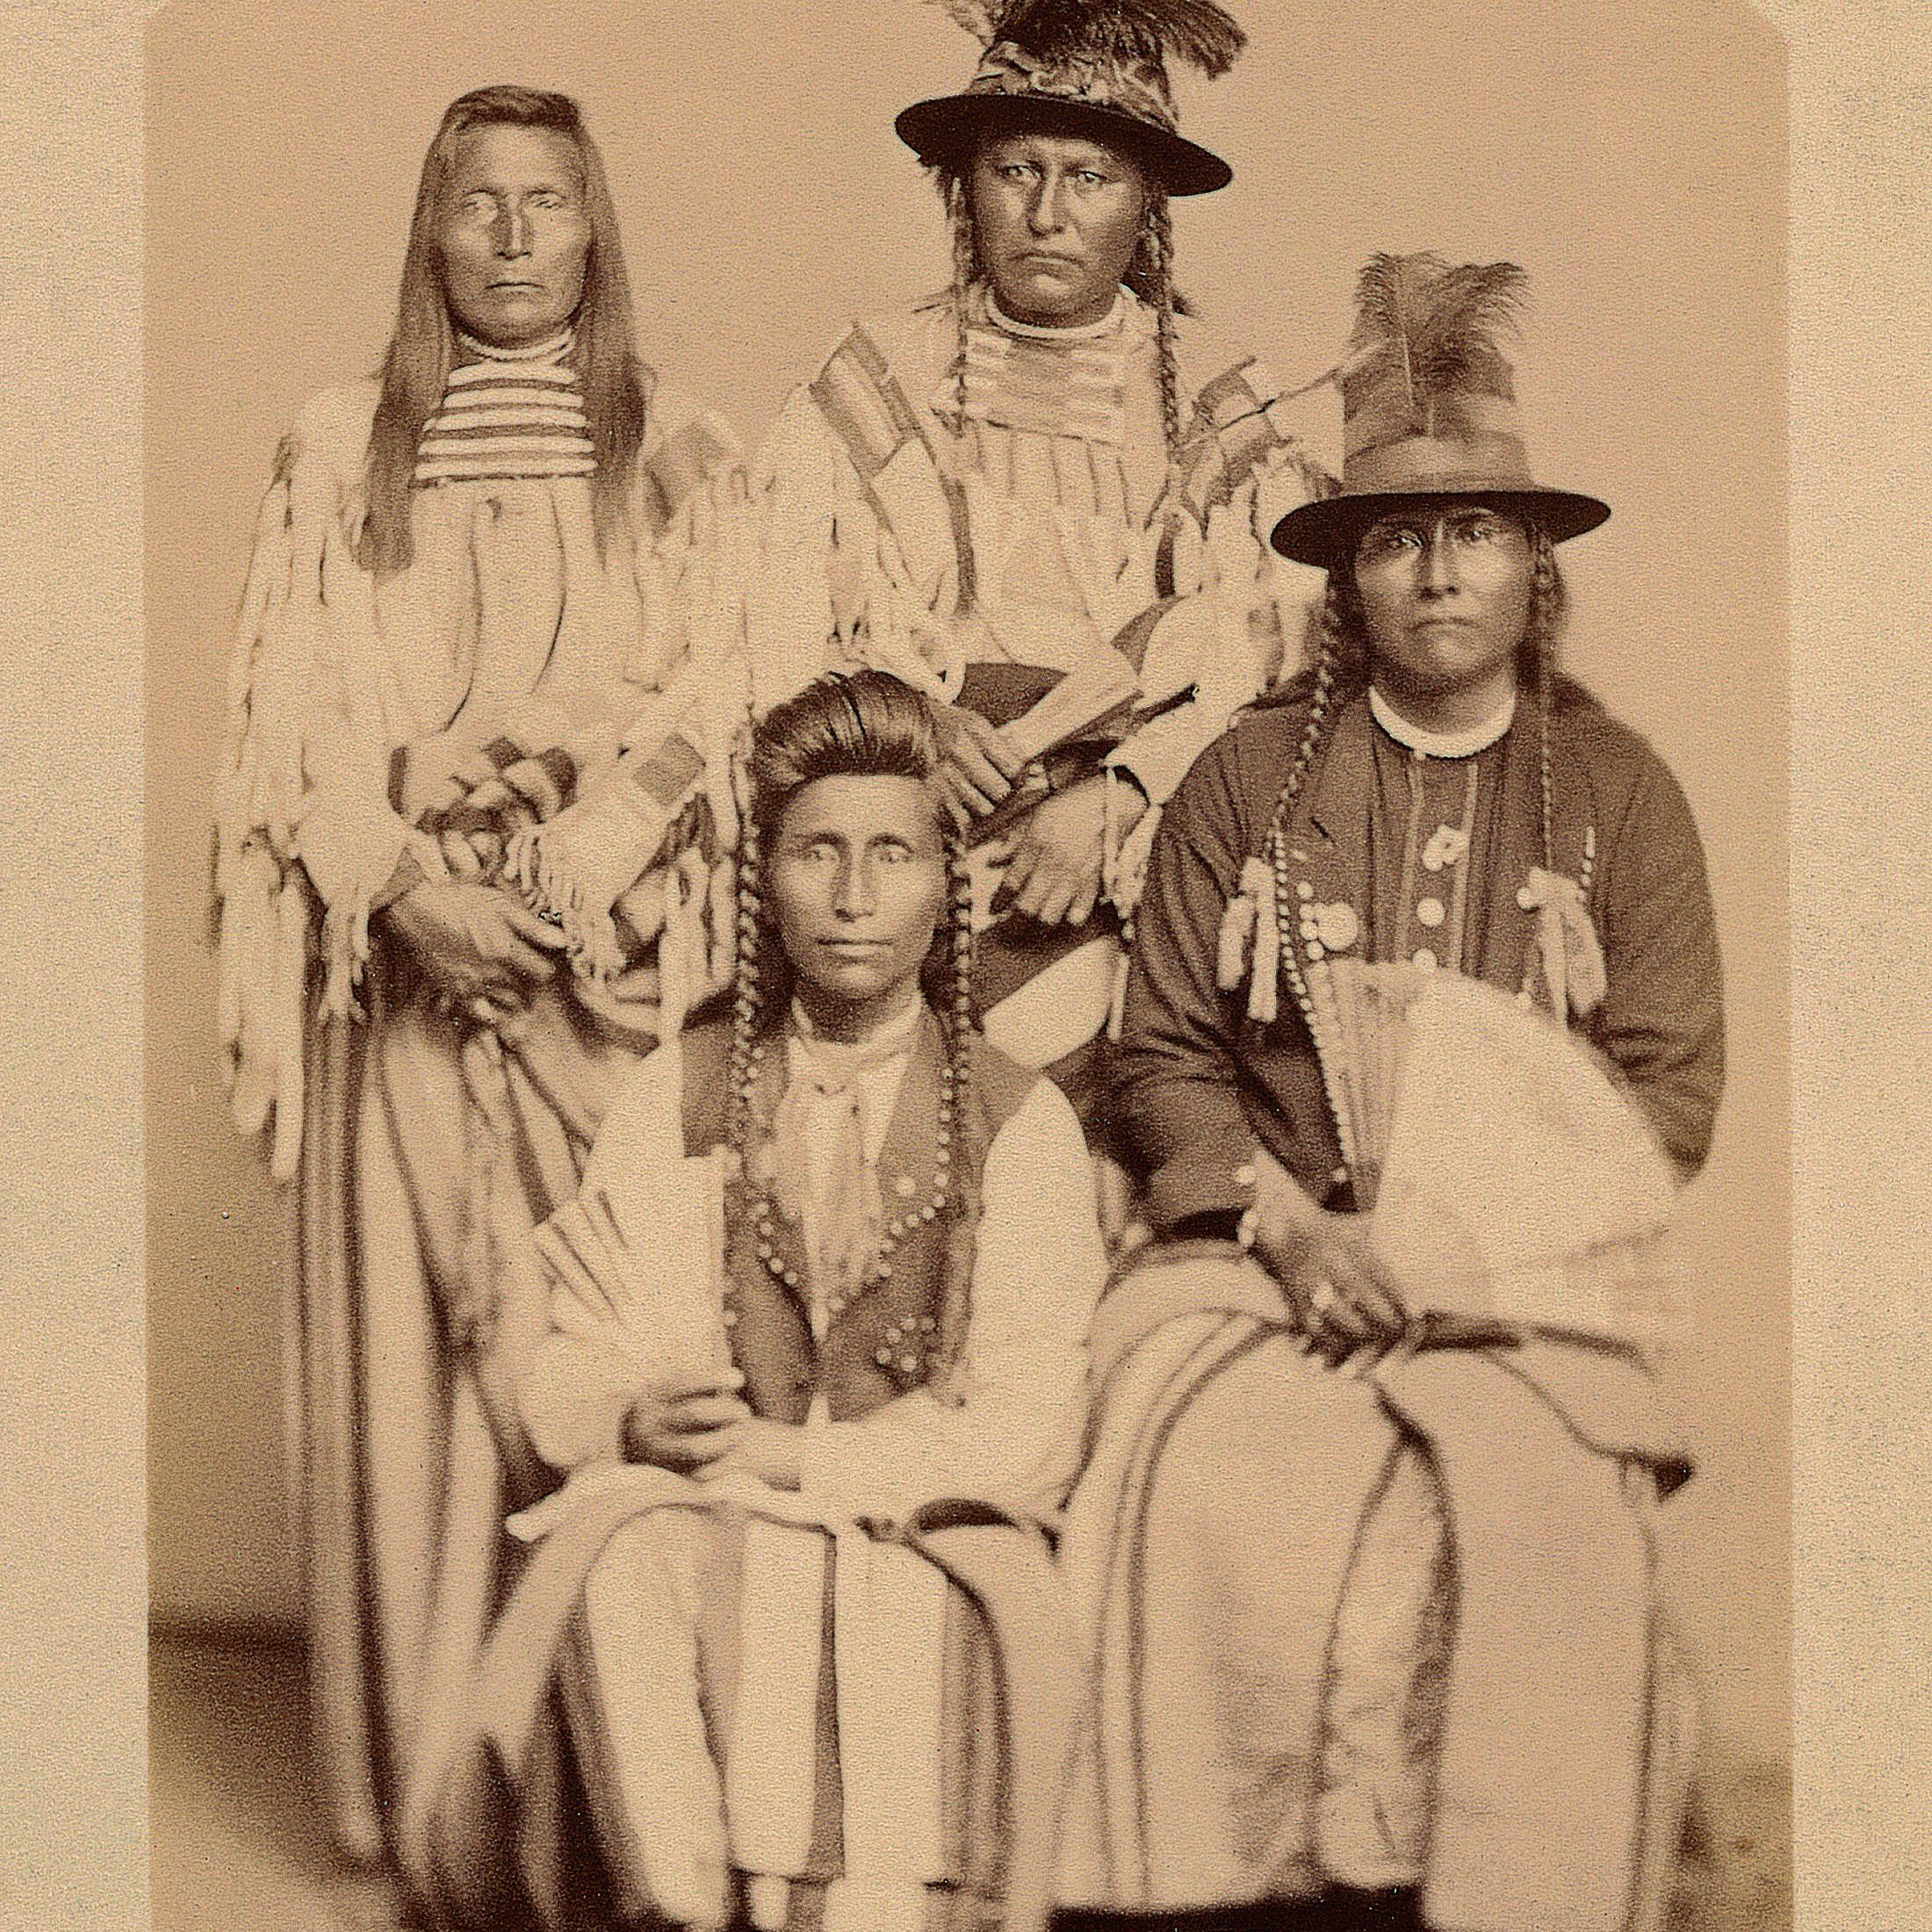 Chief Joseph and the Nez Perce Chiefs